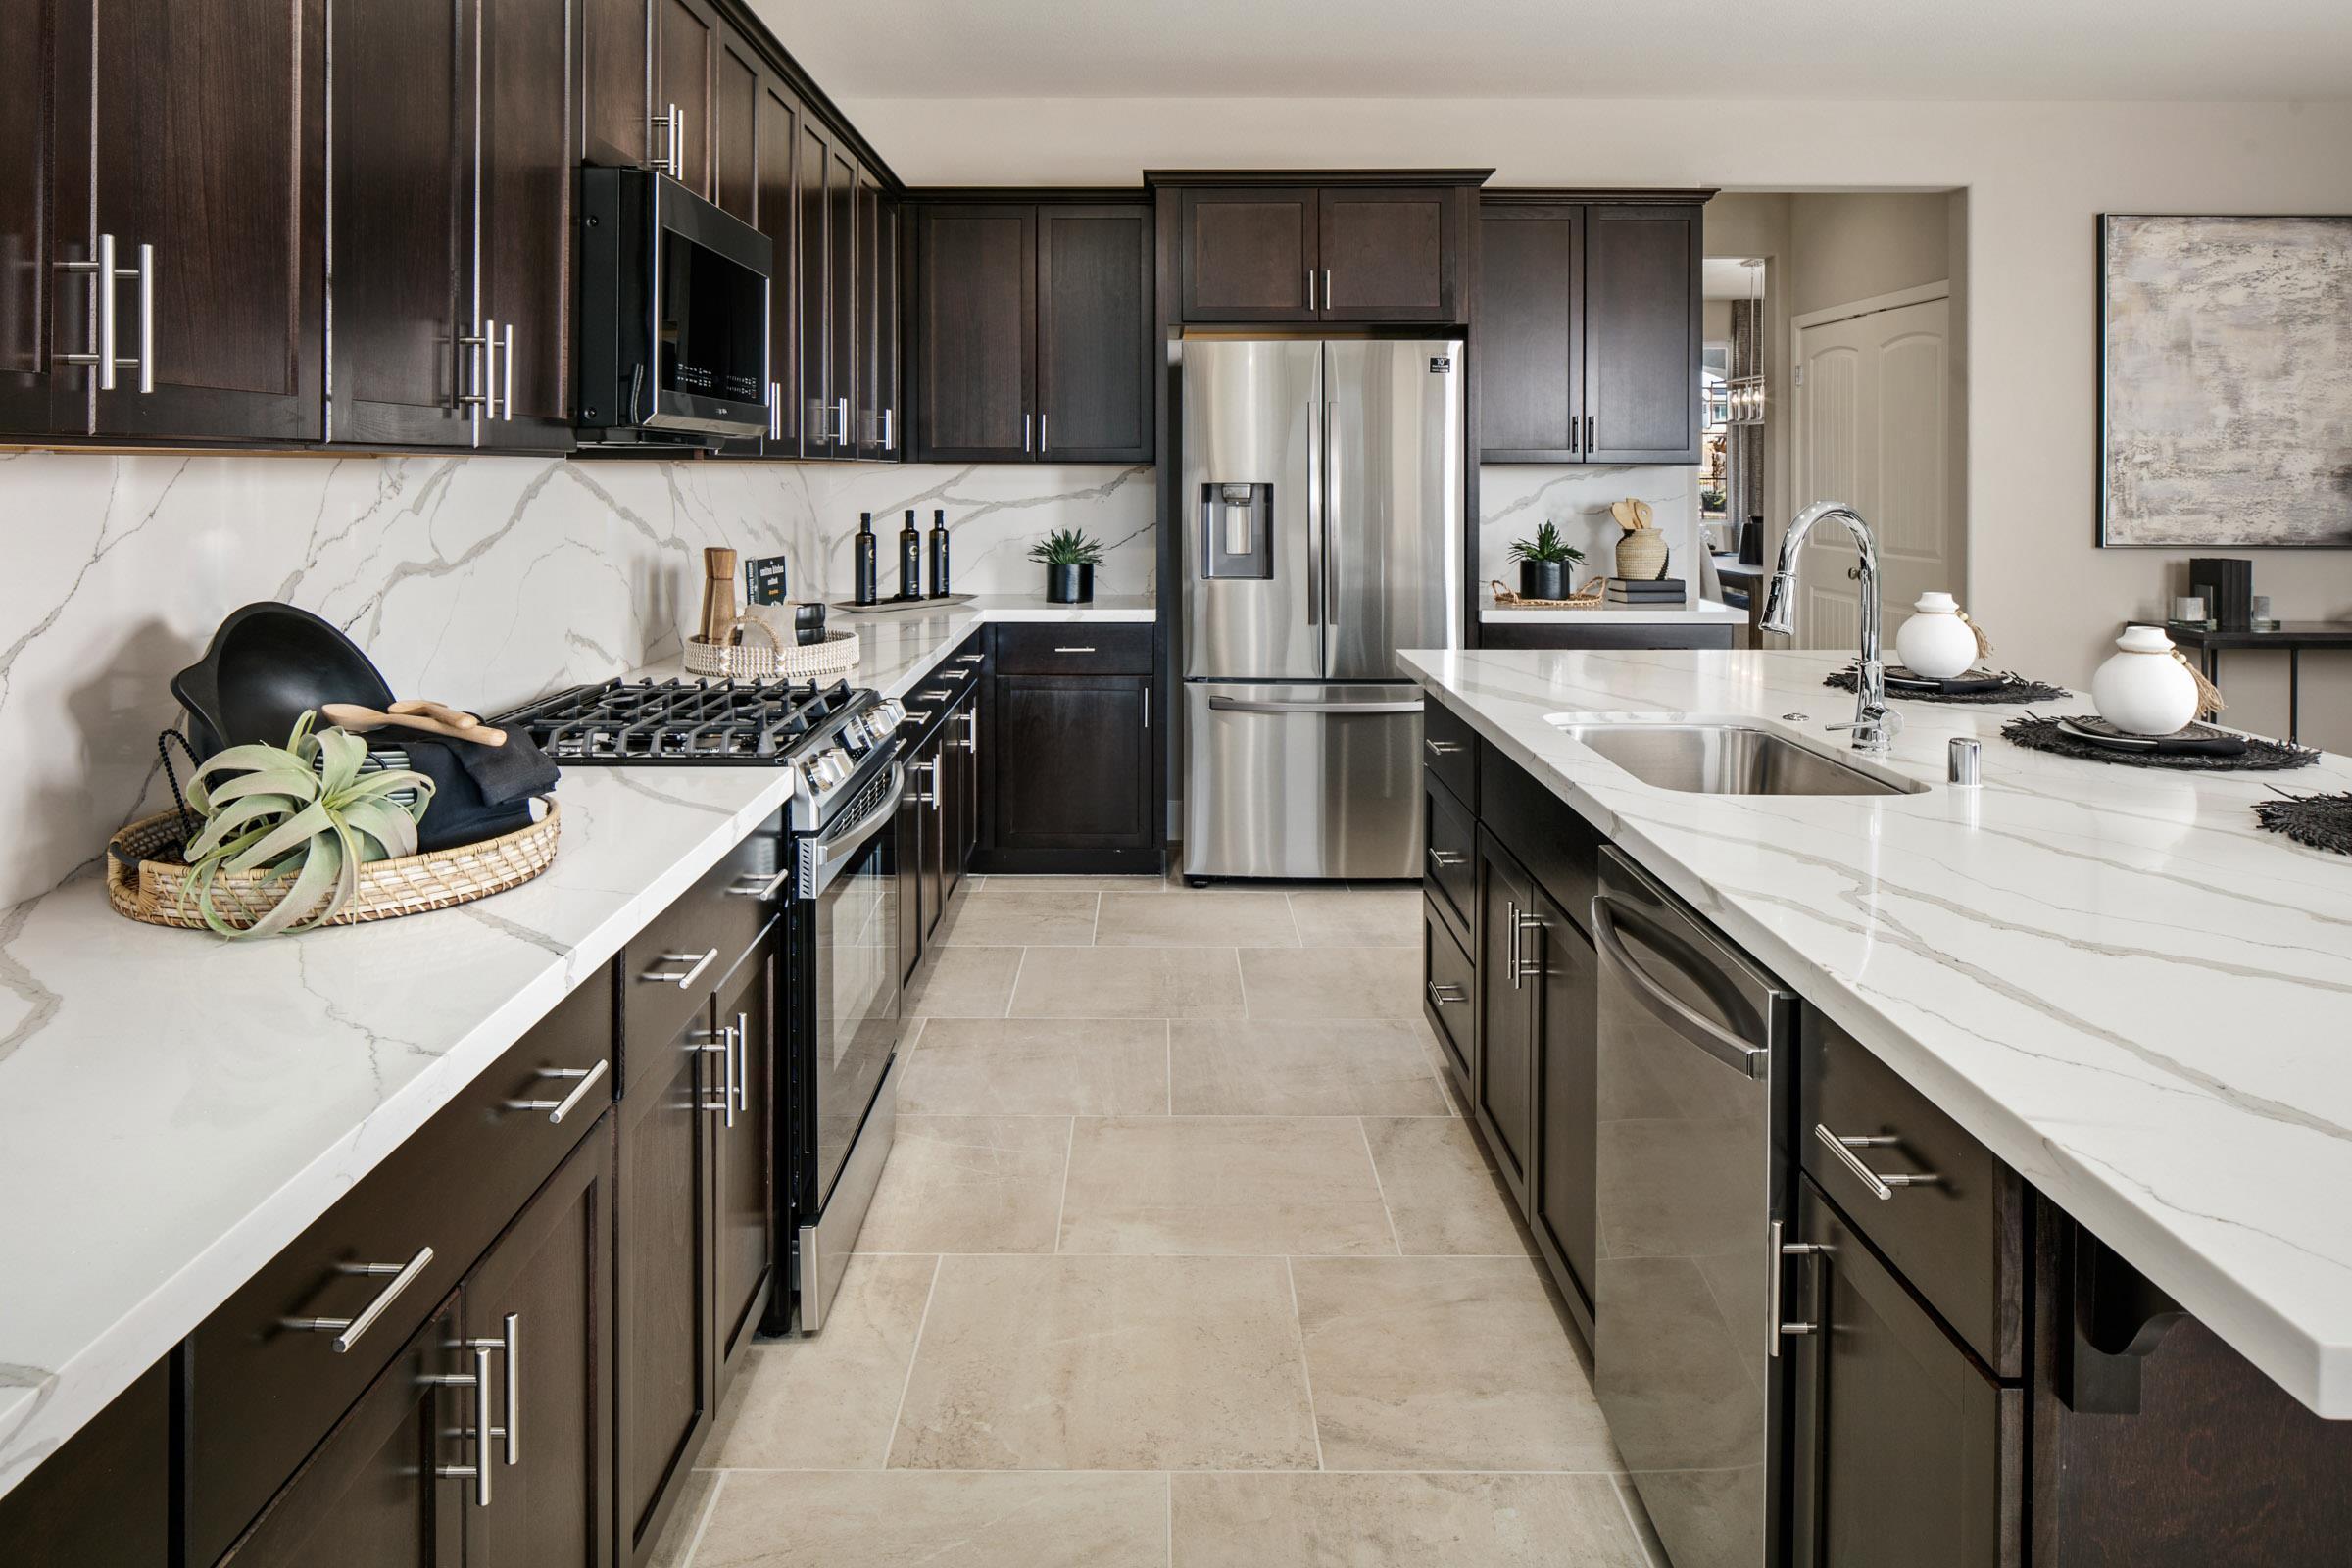 Kitchen featured in the Plan 3 By Watt Communities in Sacramento, CA